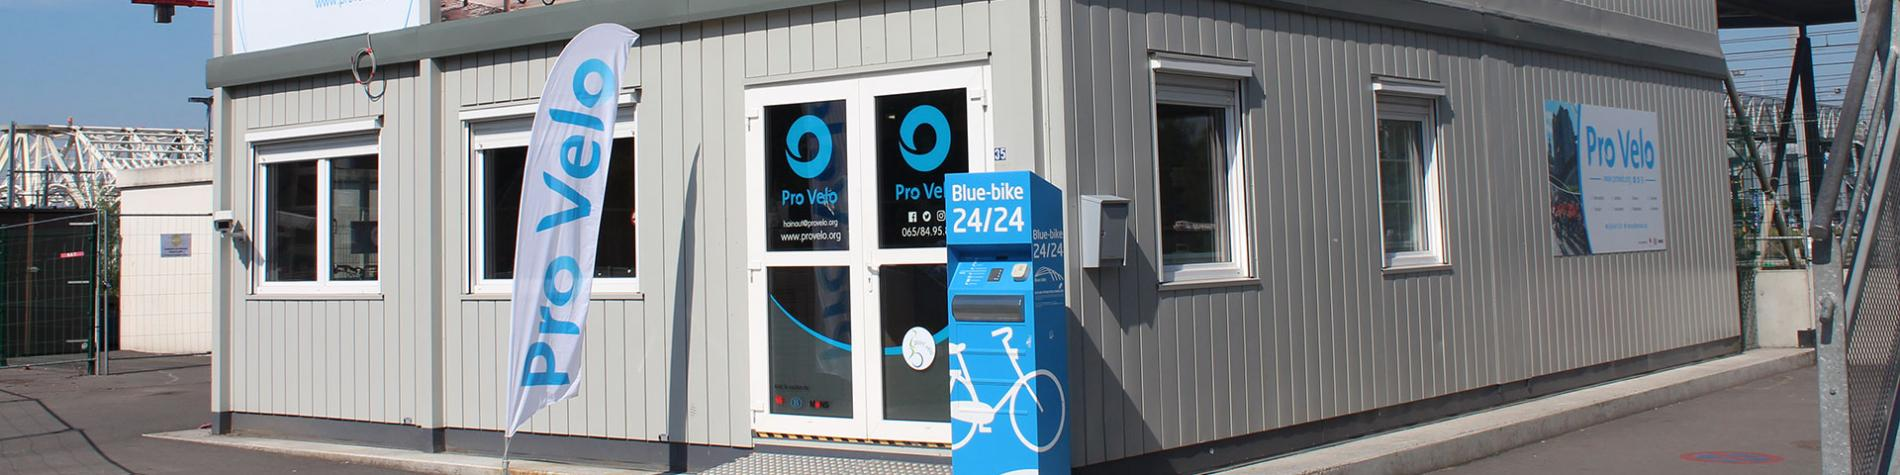 Pro Velo - Hainaut - Point Vélo - gare - Mons